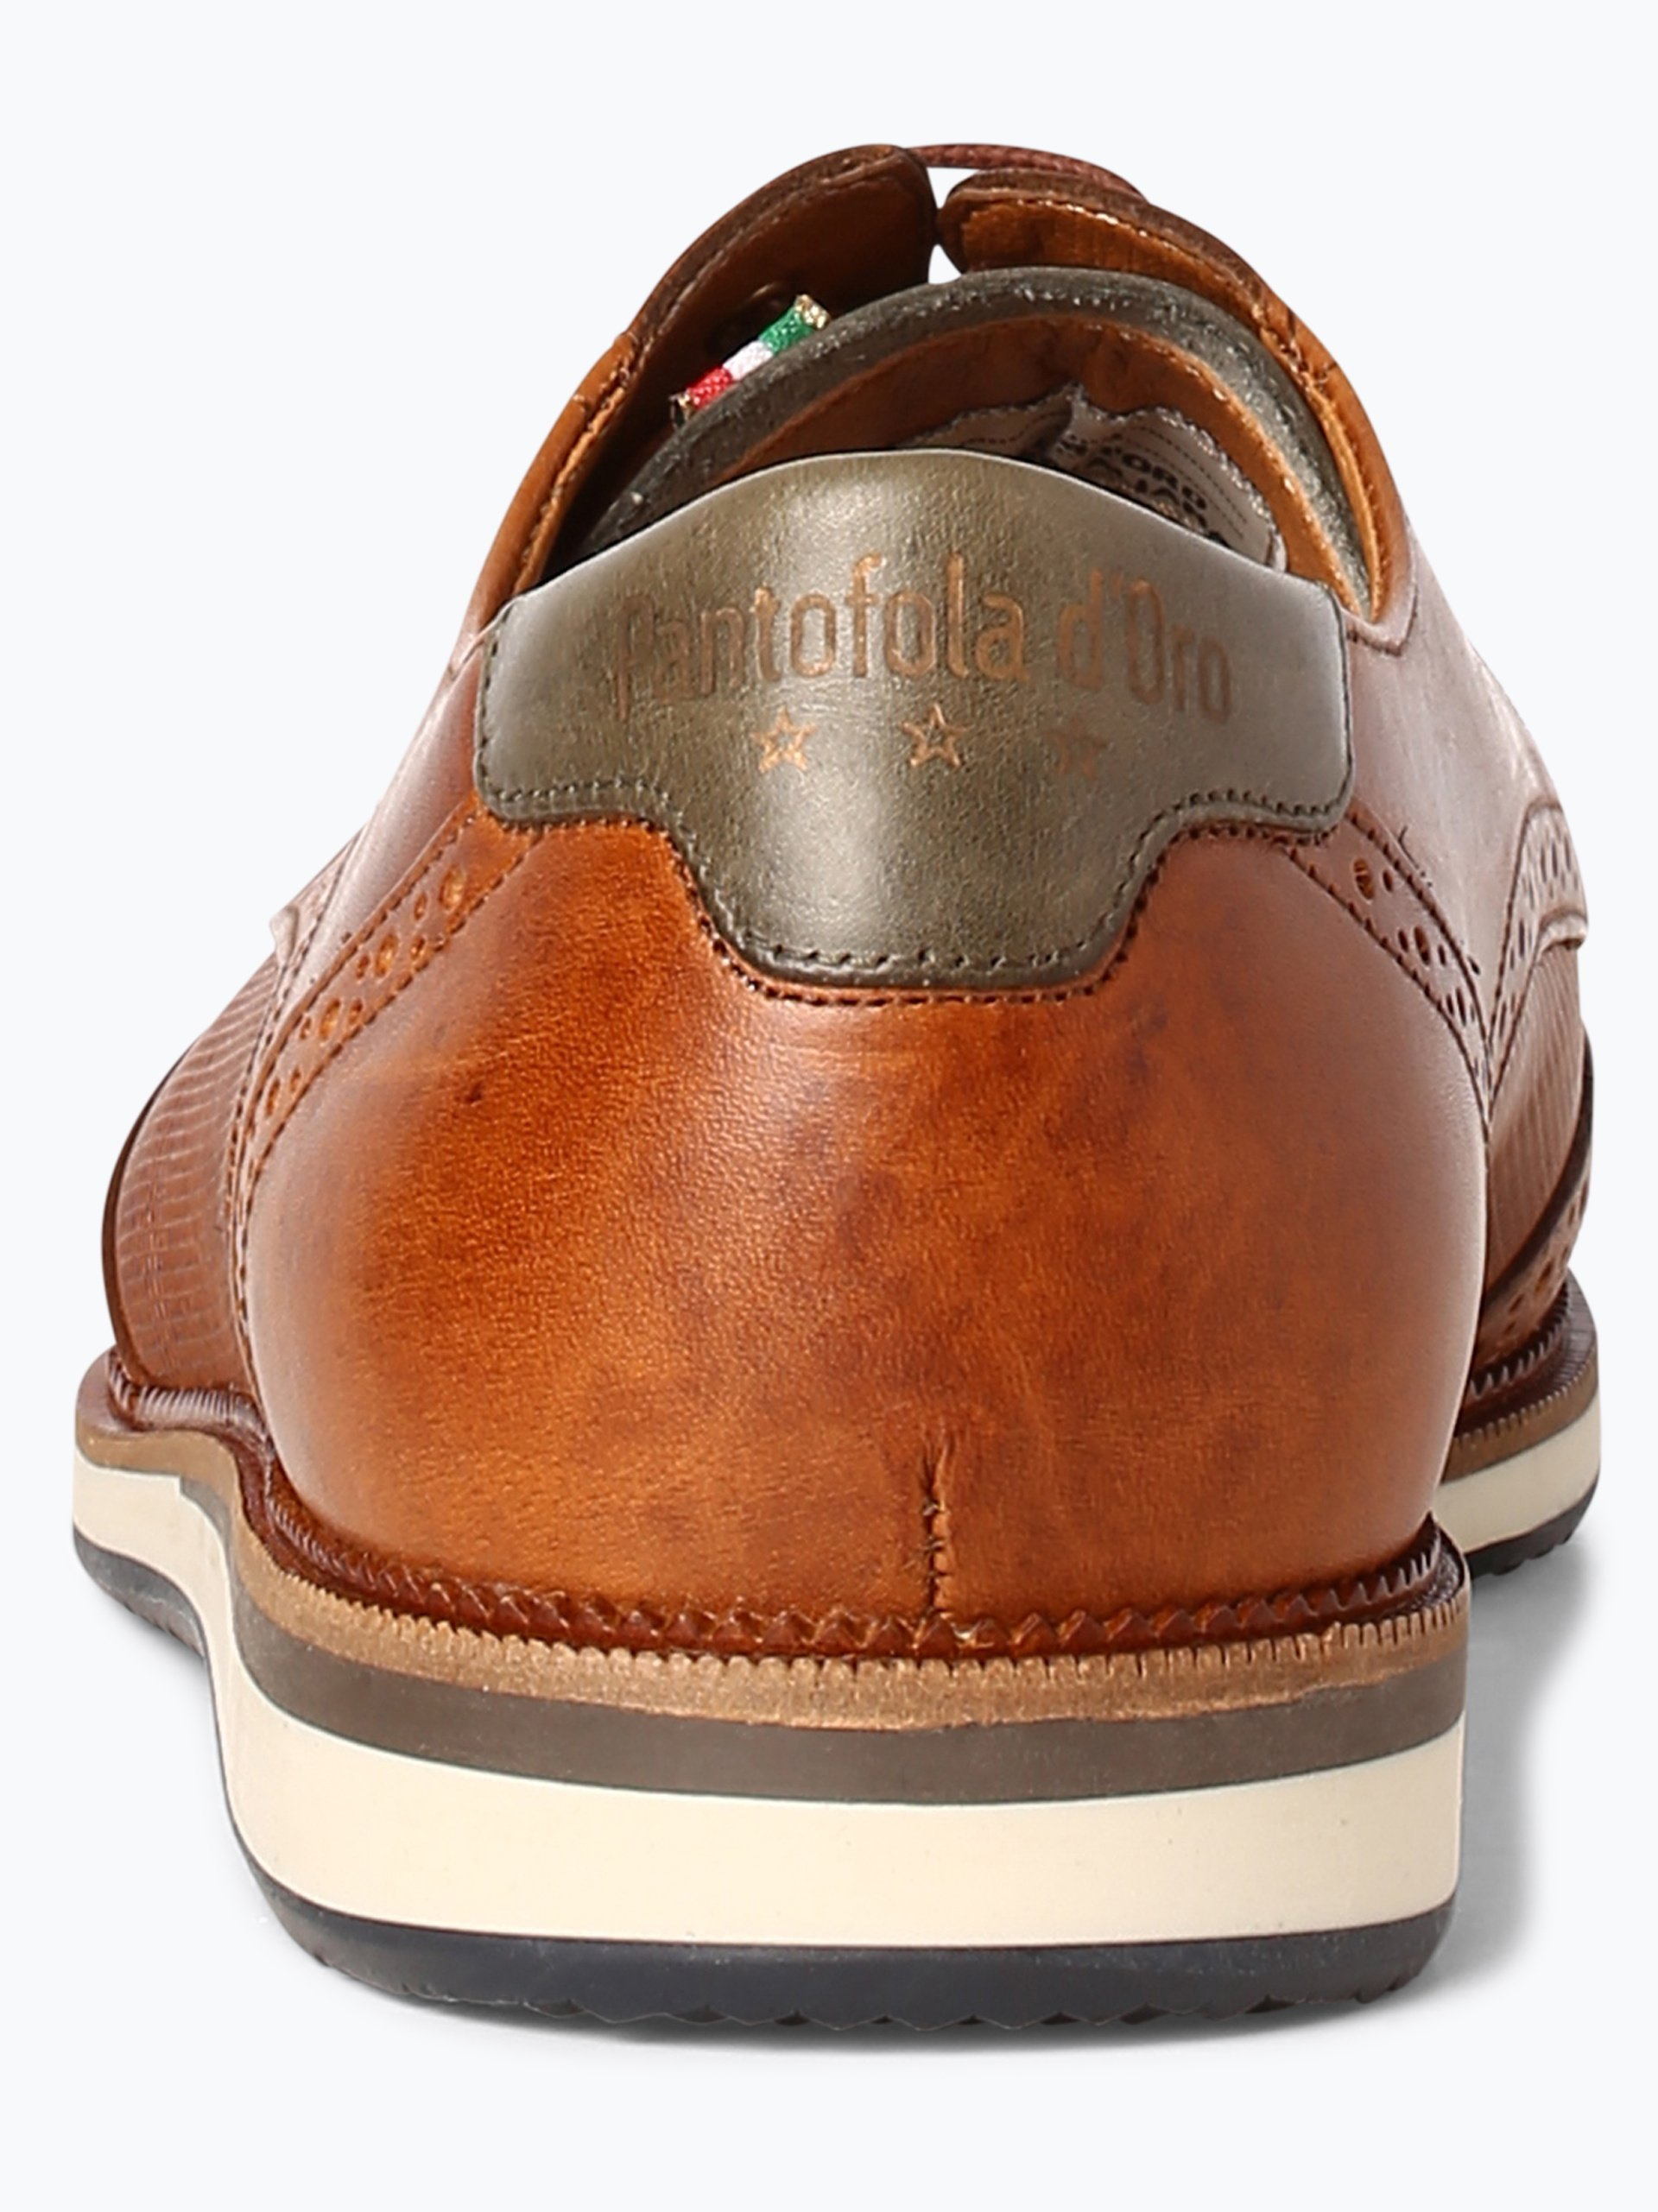 Pantofola d'Oro Herren Halbschuhe aus Leder Rubicon online